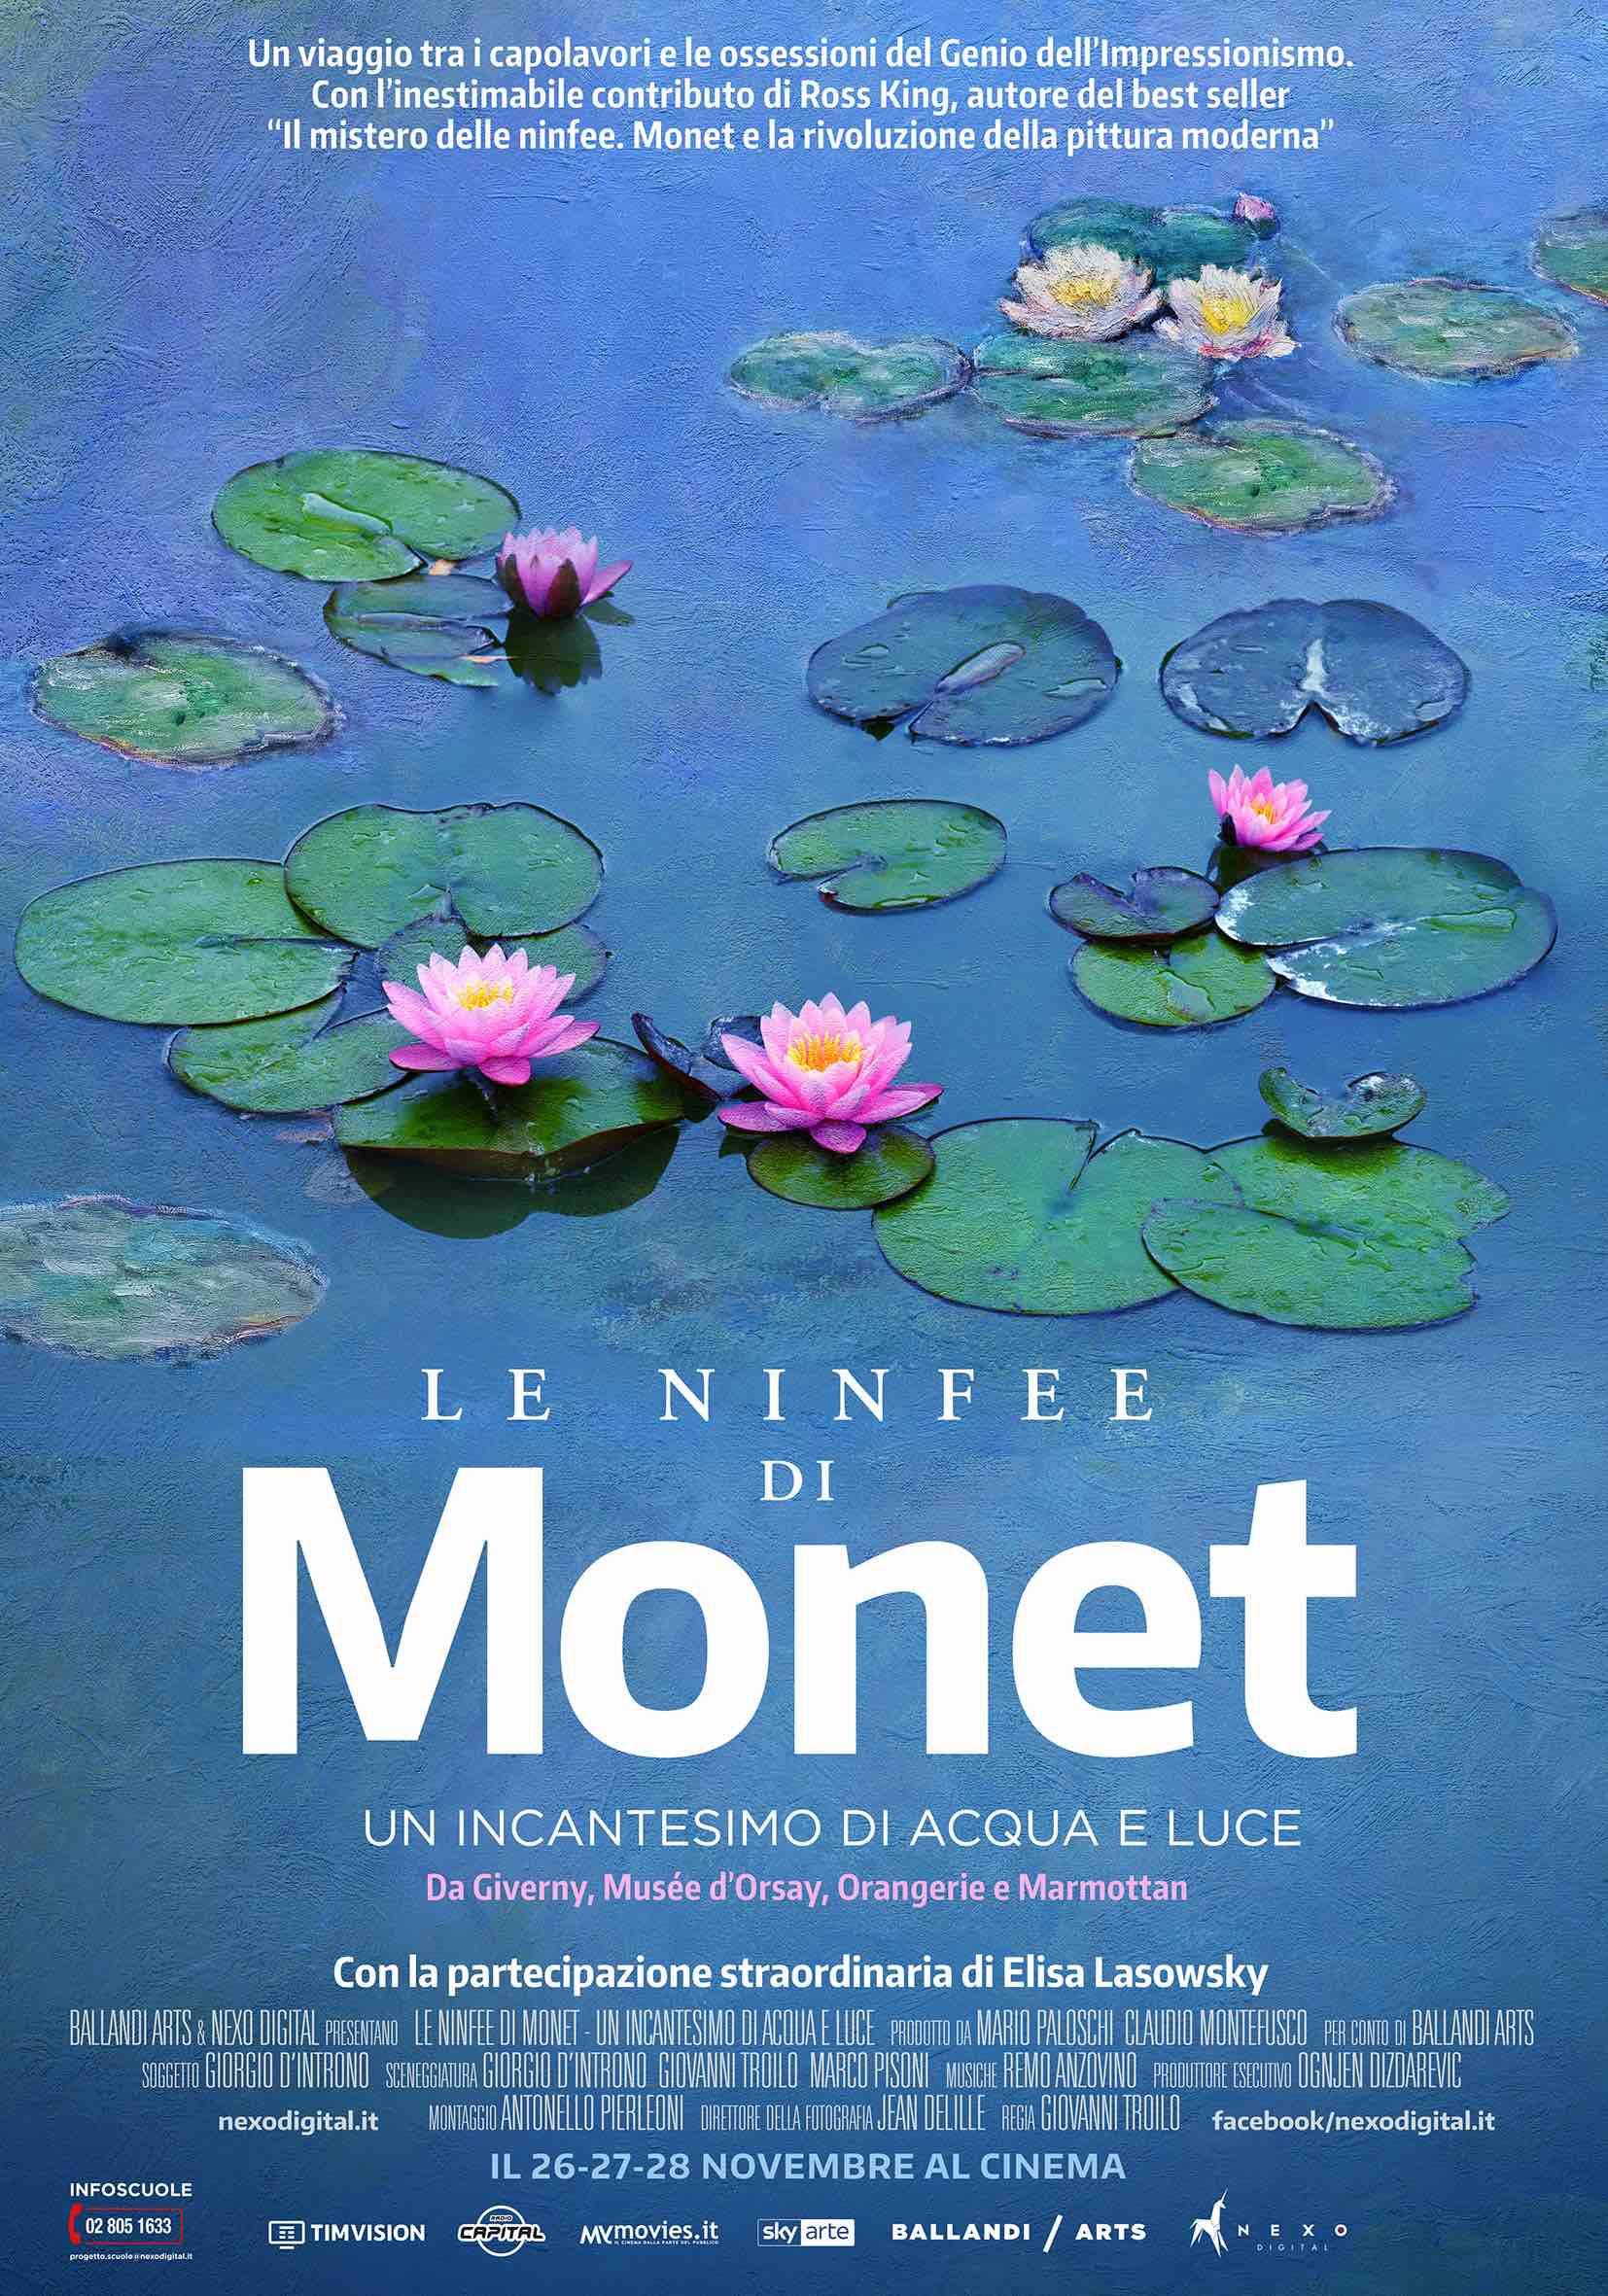 Le ninfee di Monet. Un incantesimo di acqua e luce